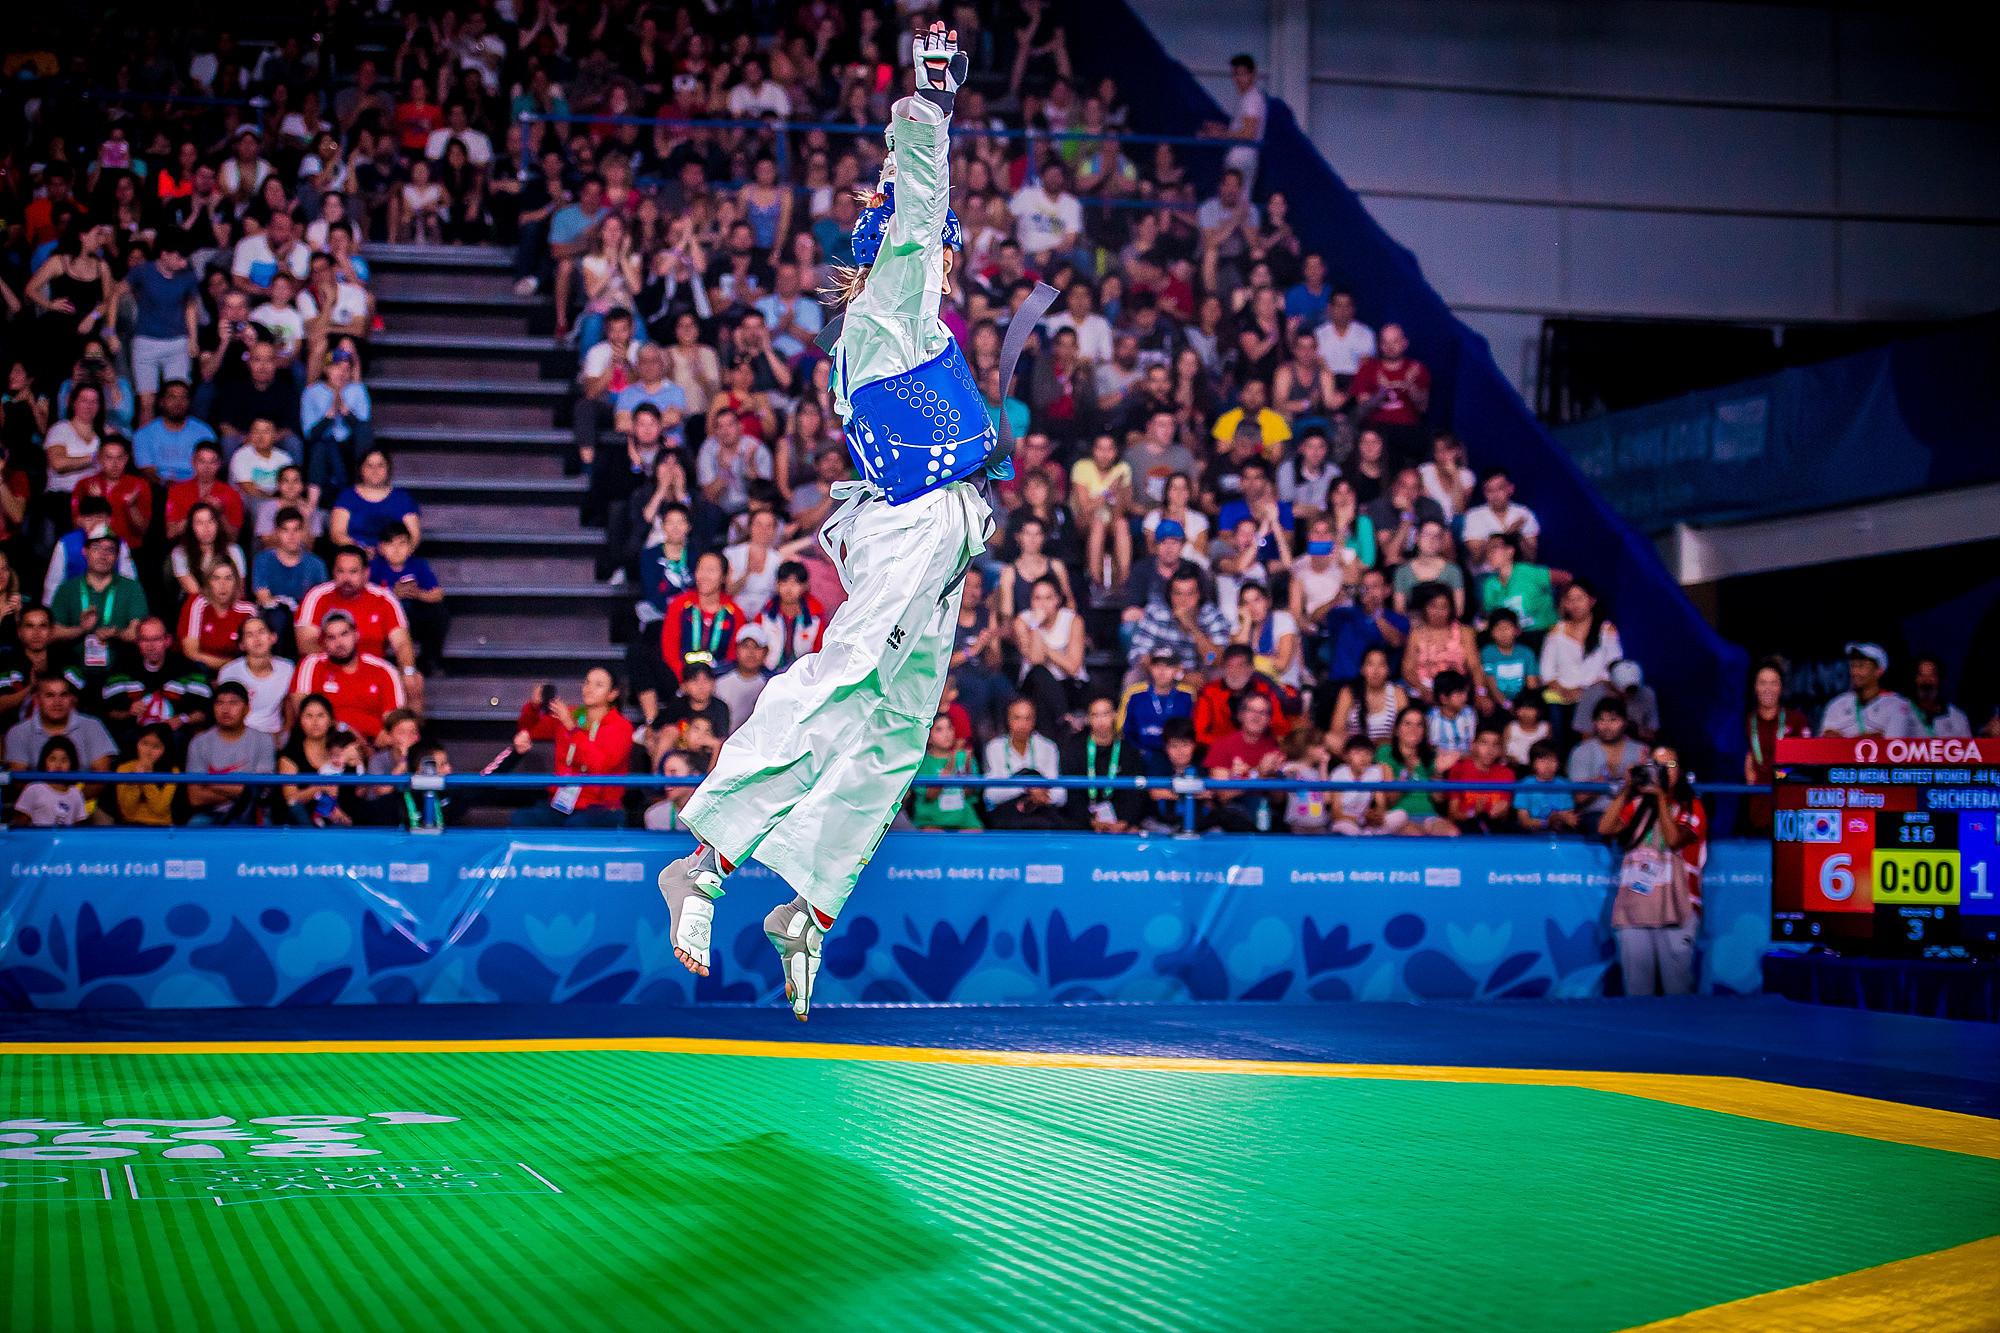 Taekwondo mixed team event to be contested at Dakar 2022